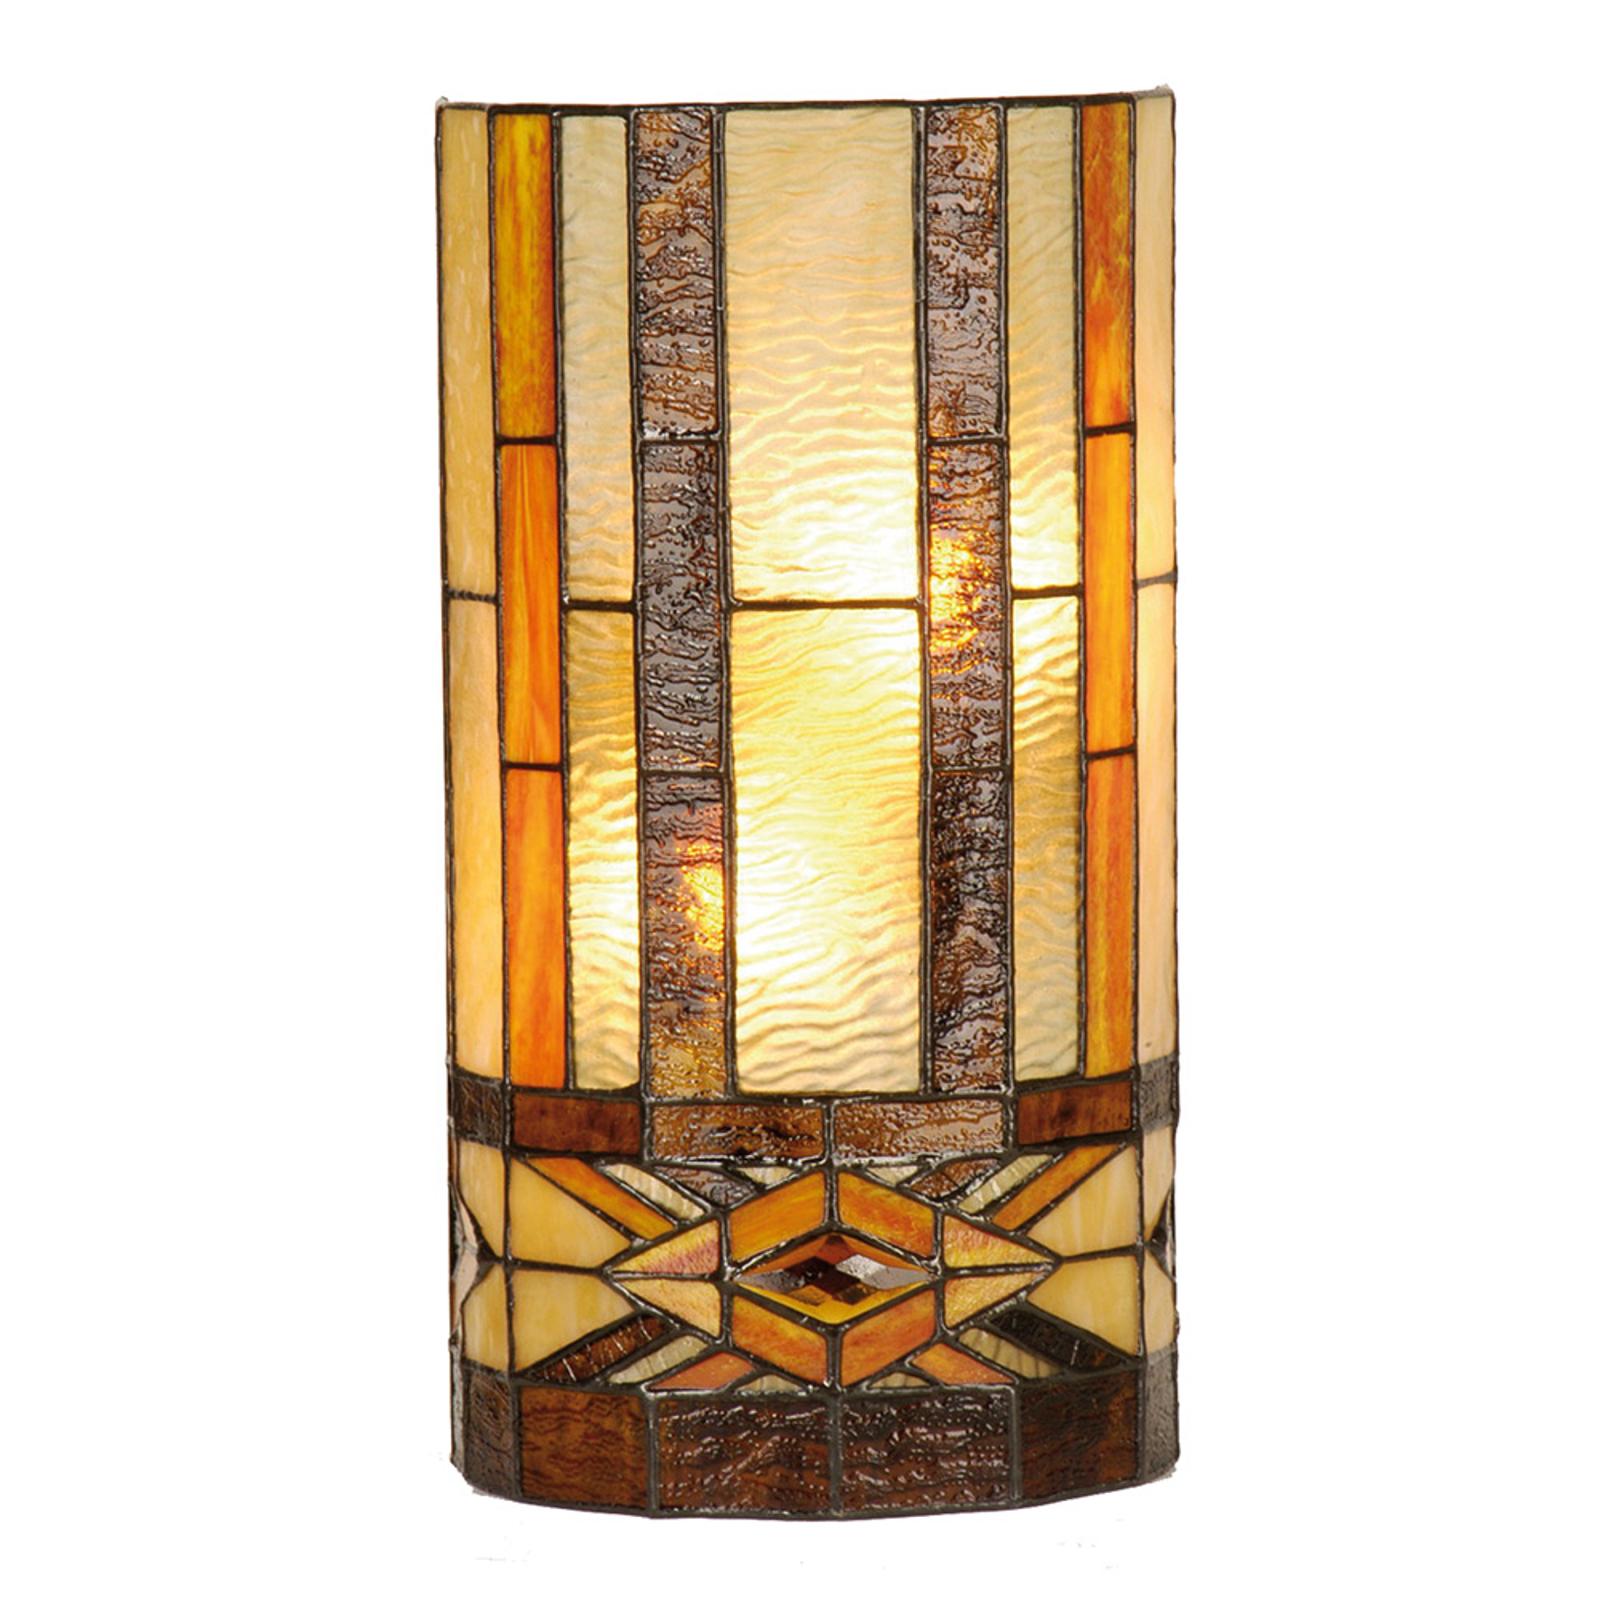 Miwa - wandlamp in Tiffany-stijl